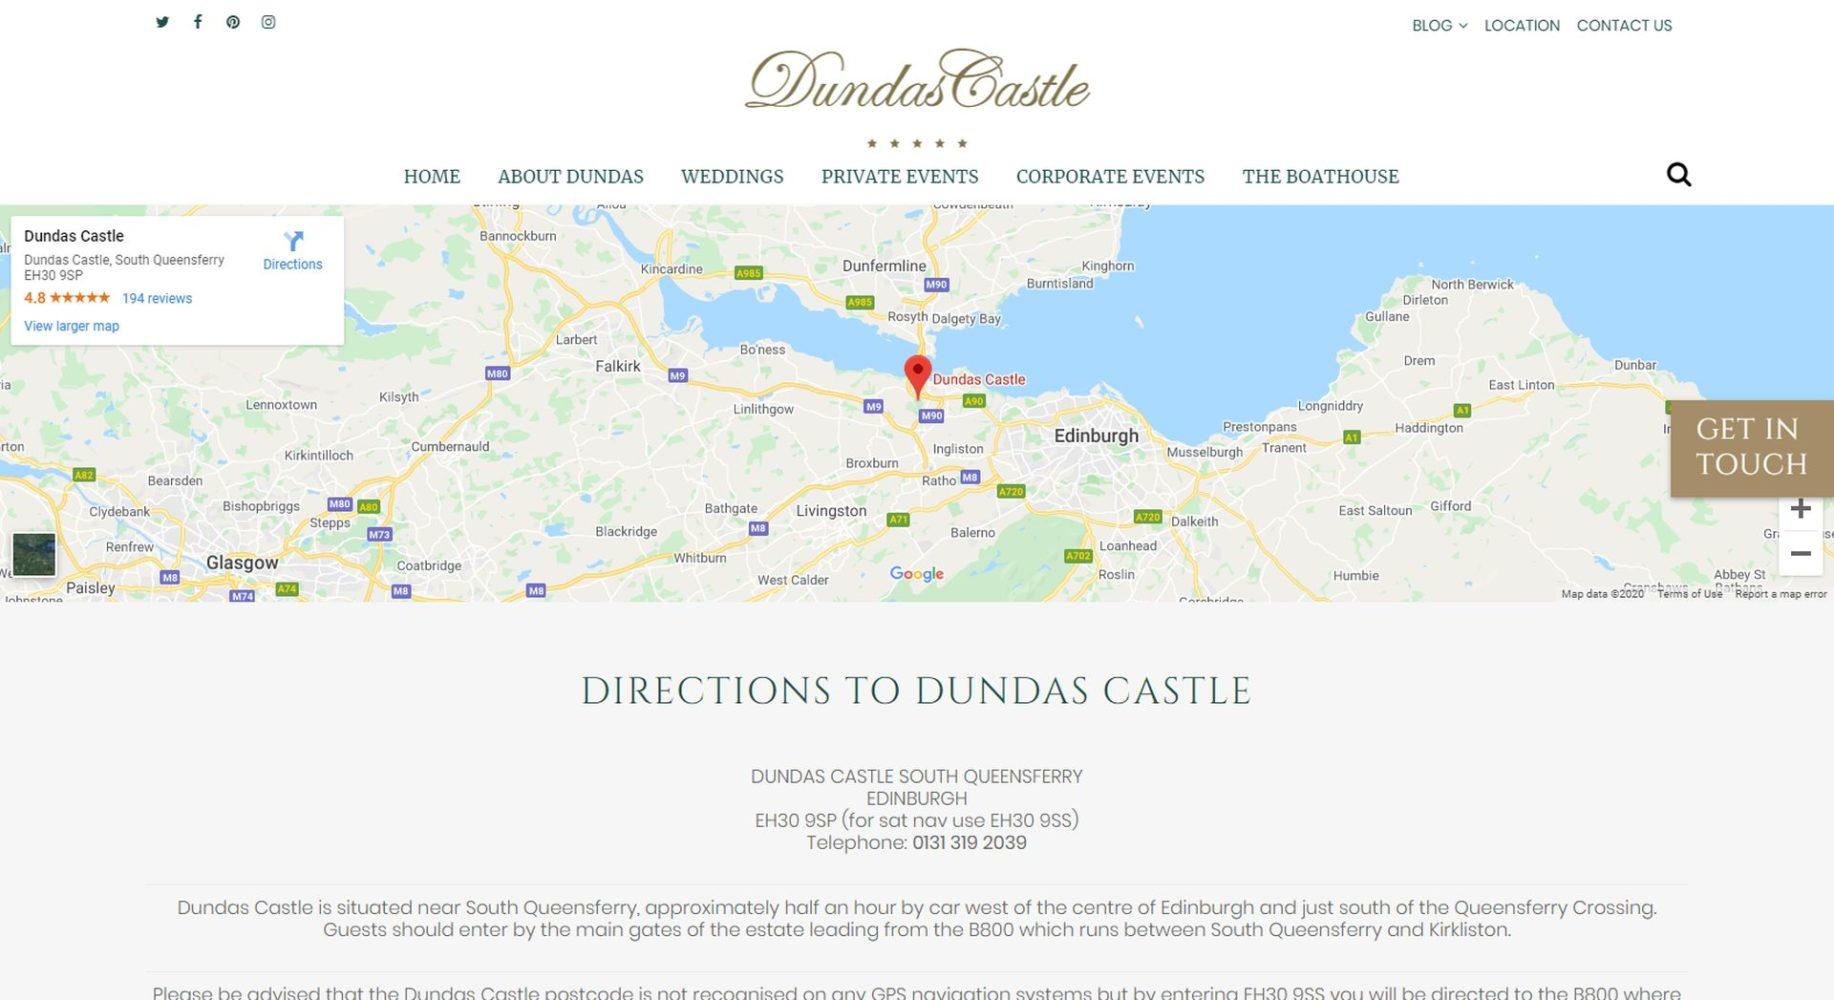 Dundas Castle Website Design Location